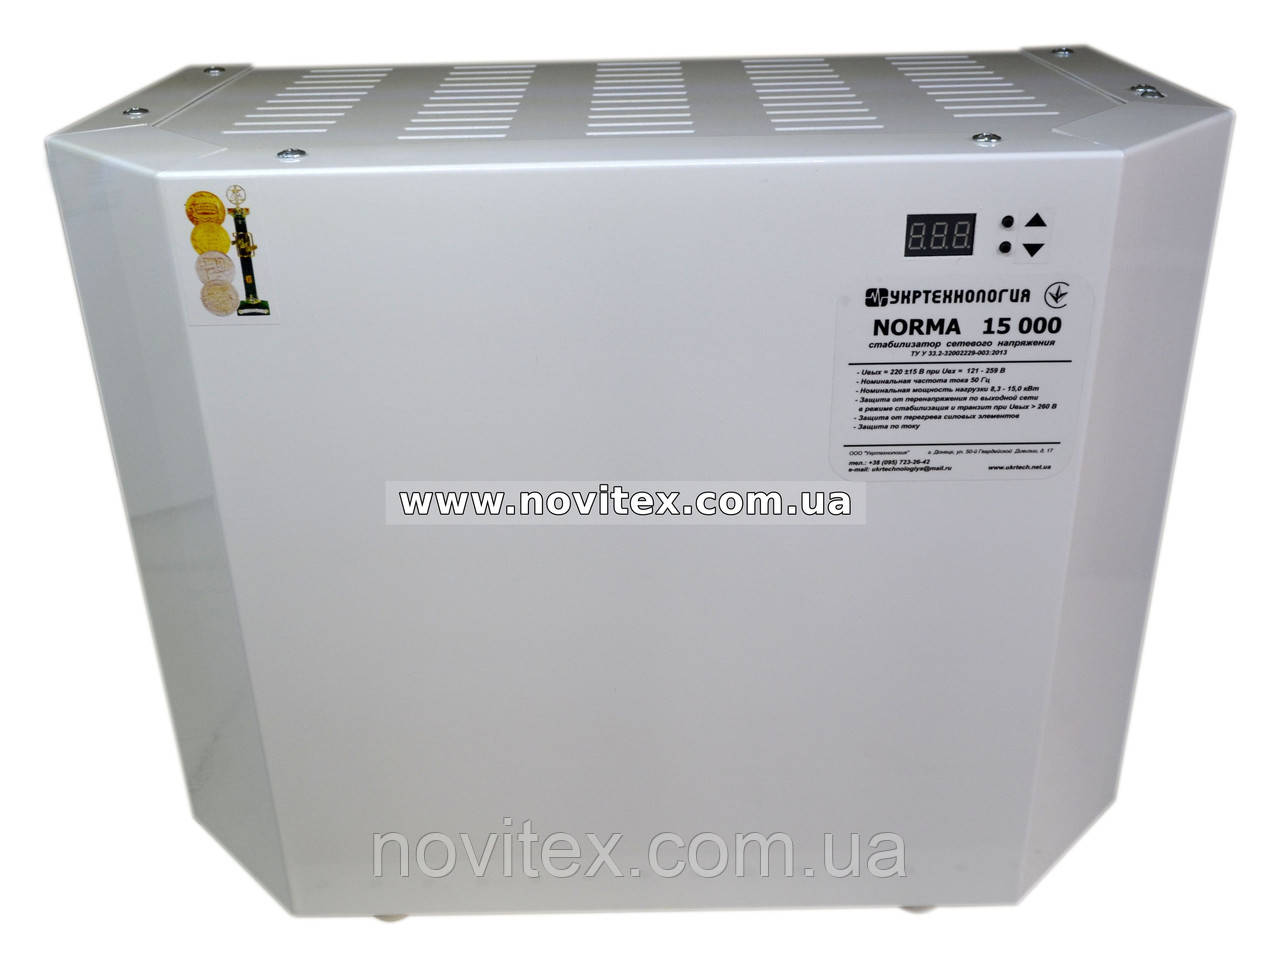 Стабилизатор Укртехнология НСН Norma 15000